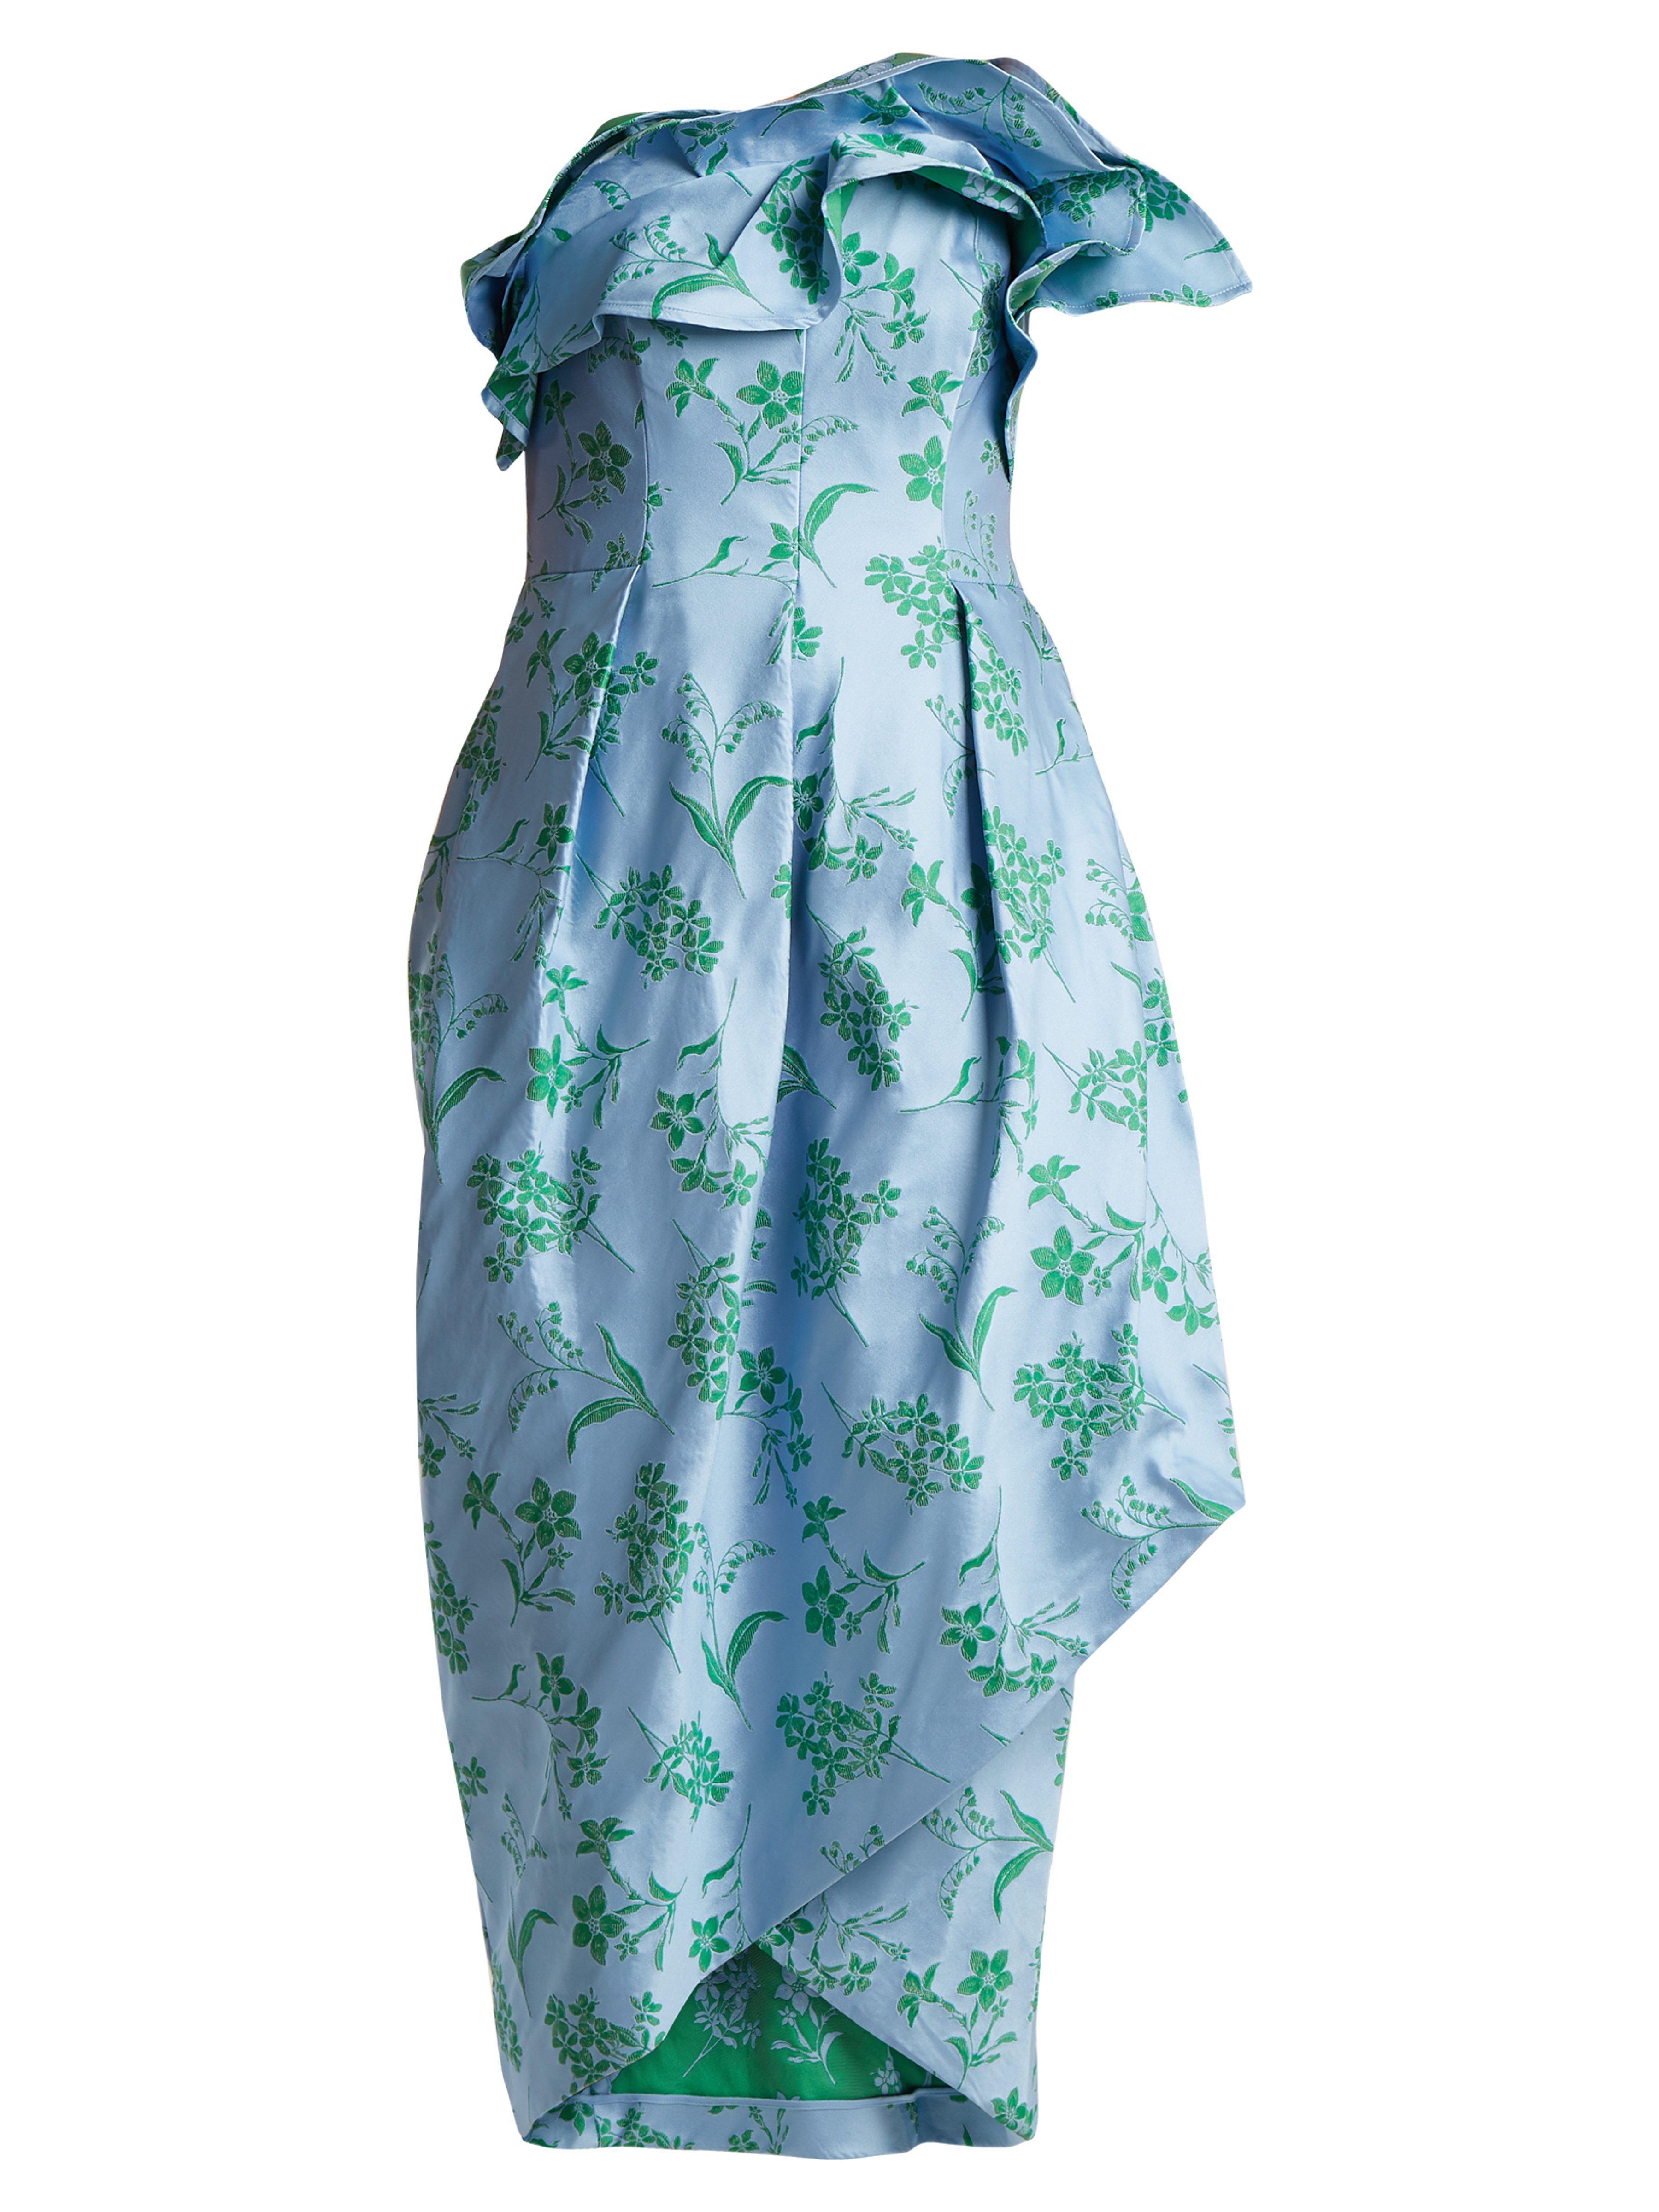 eafc5af39bb85 Lyst - Robe bustier à imprimé fleuri Carolina Herrera en coloris ...